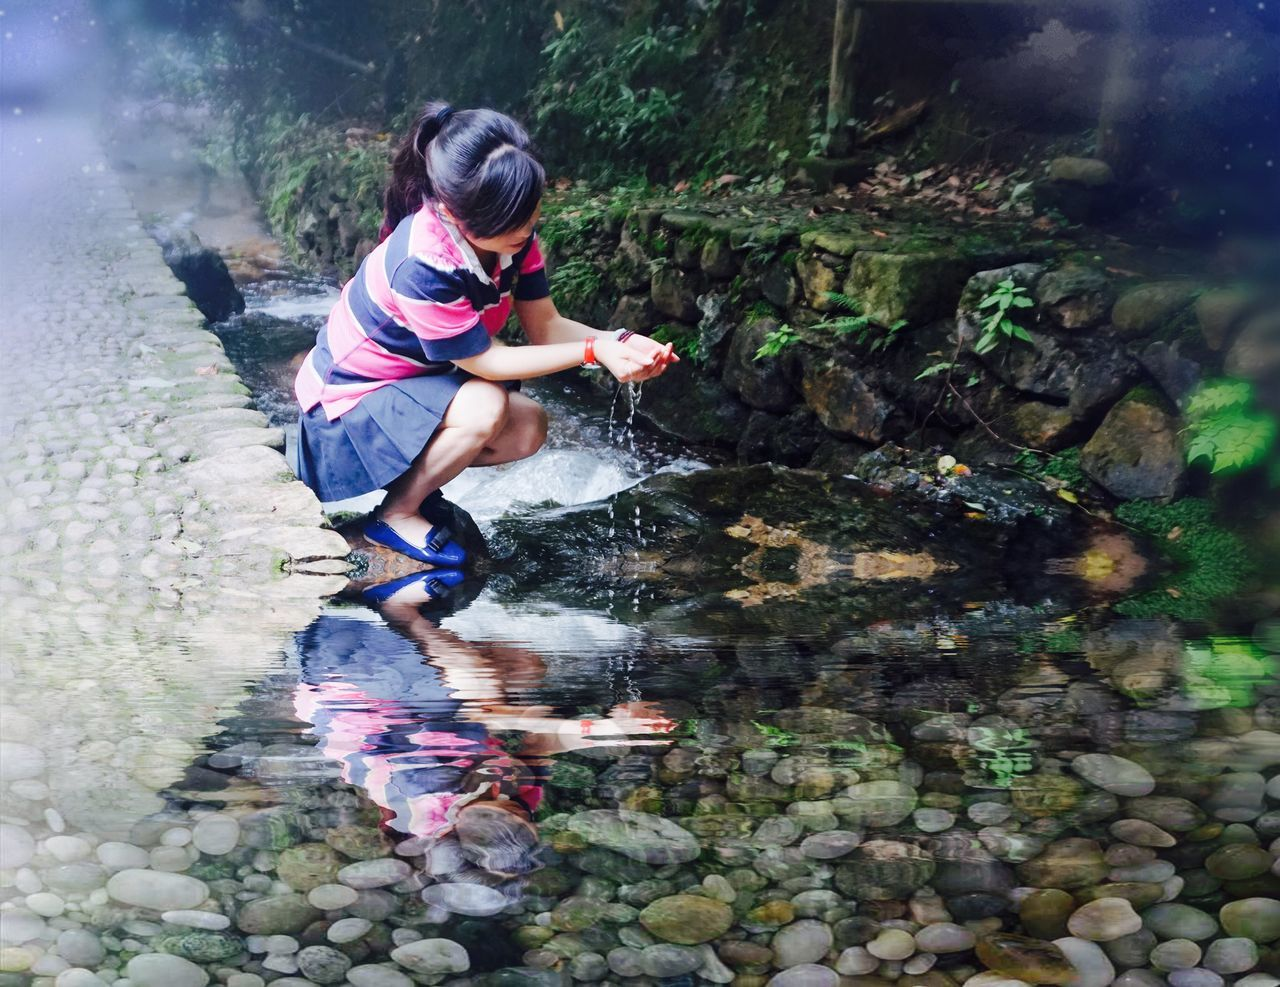 FULL LENGTH OF CHILD ON WATER